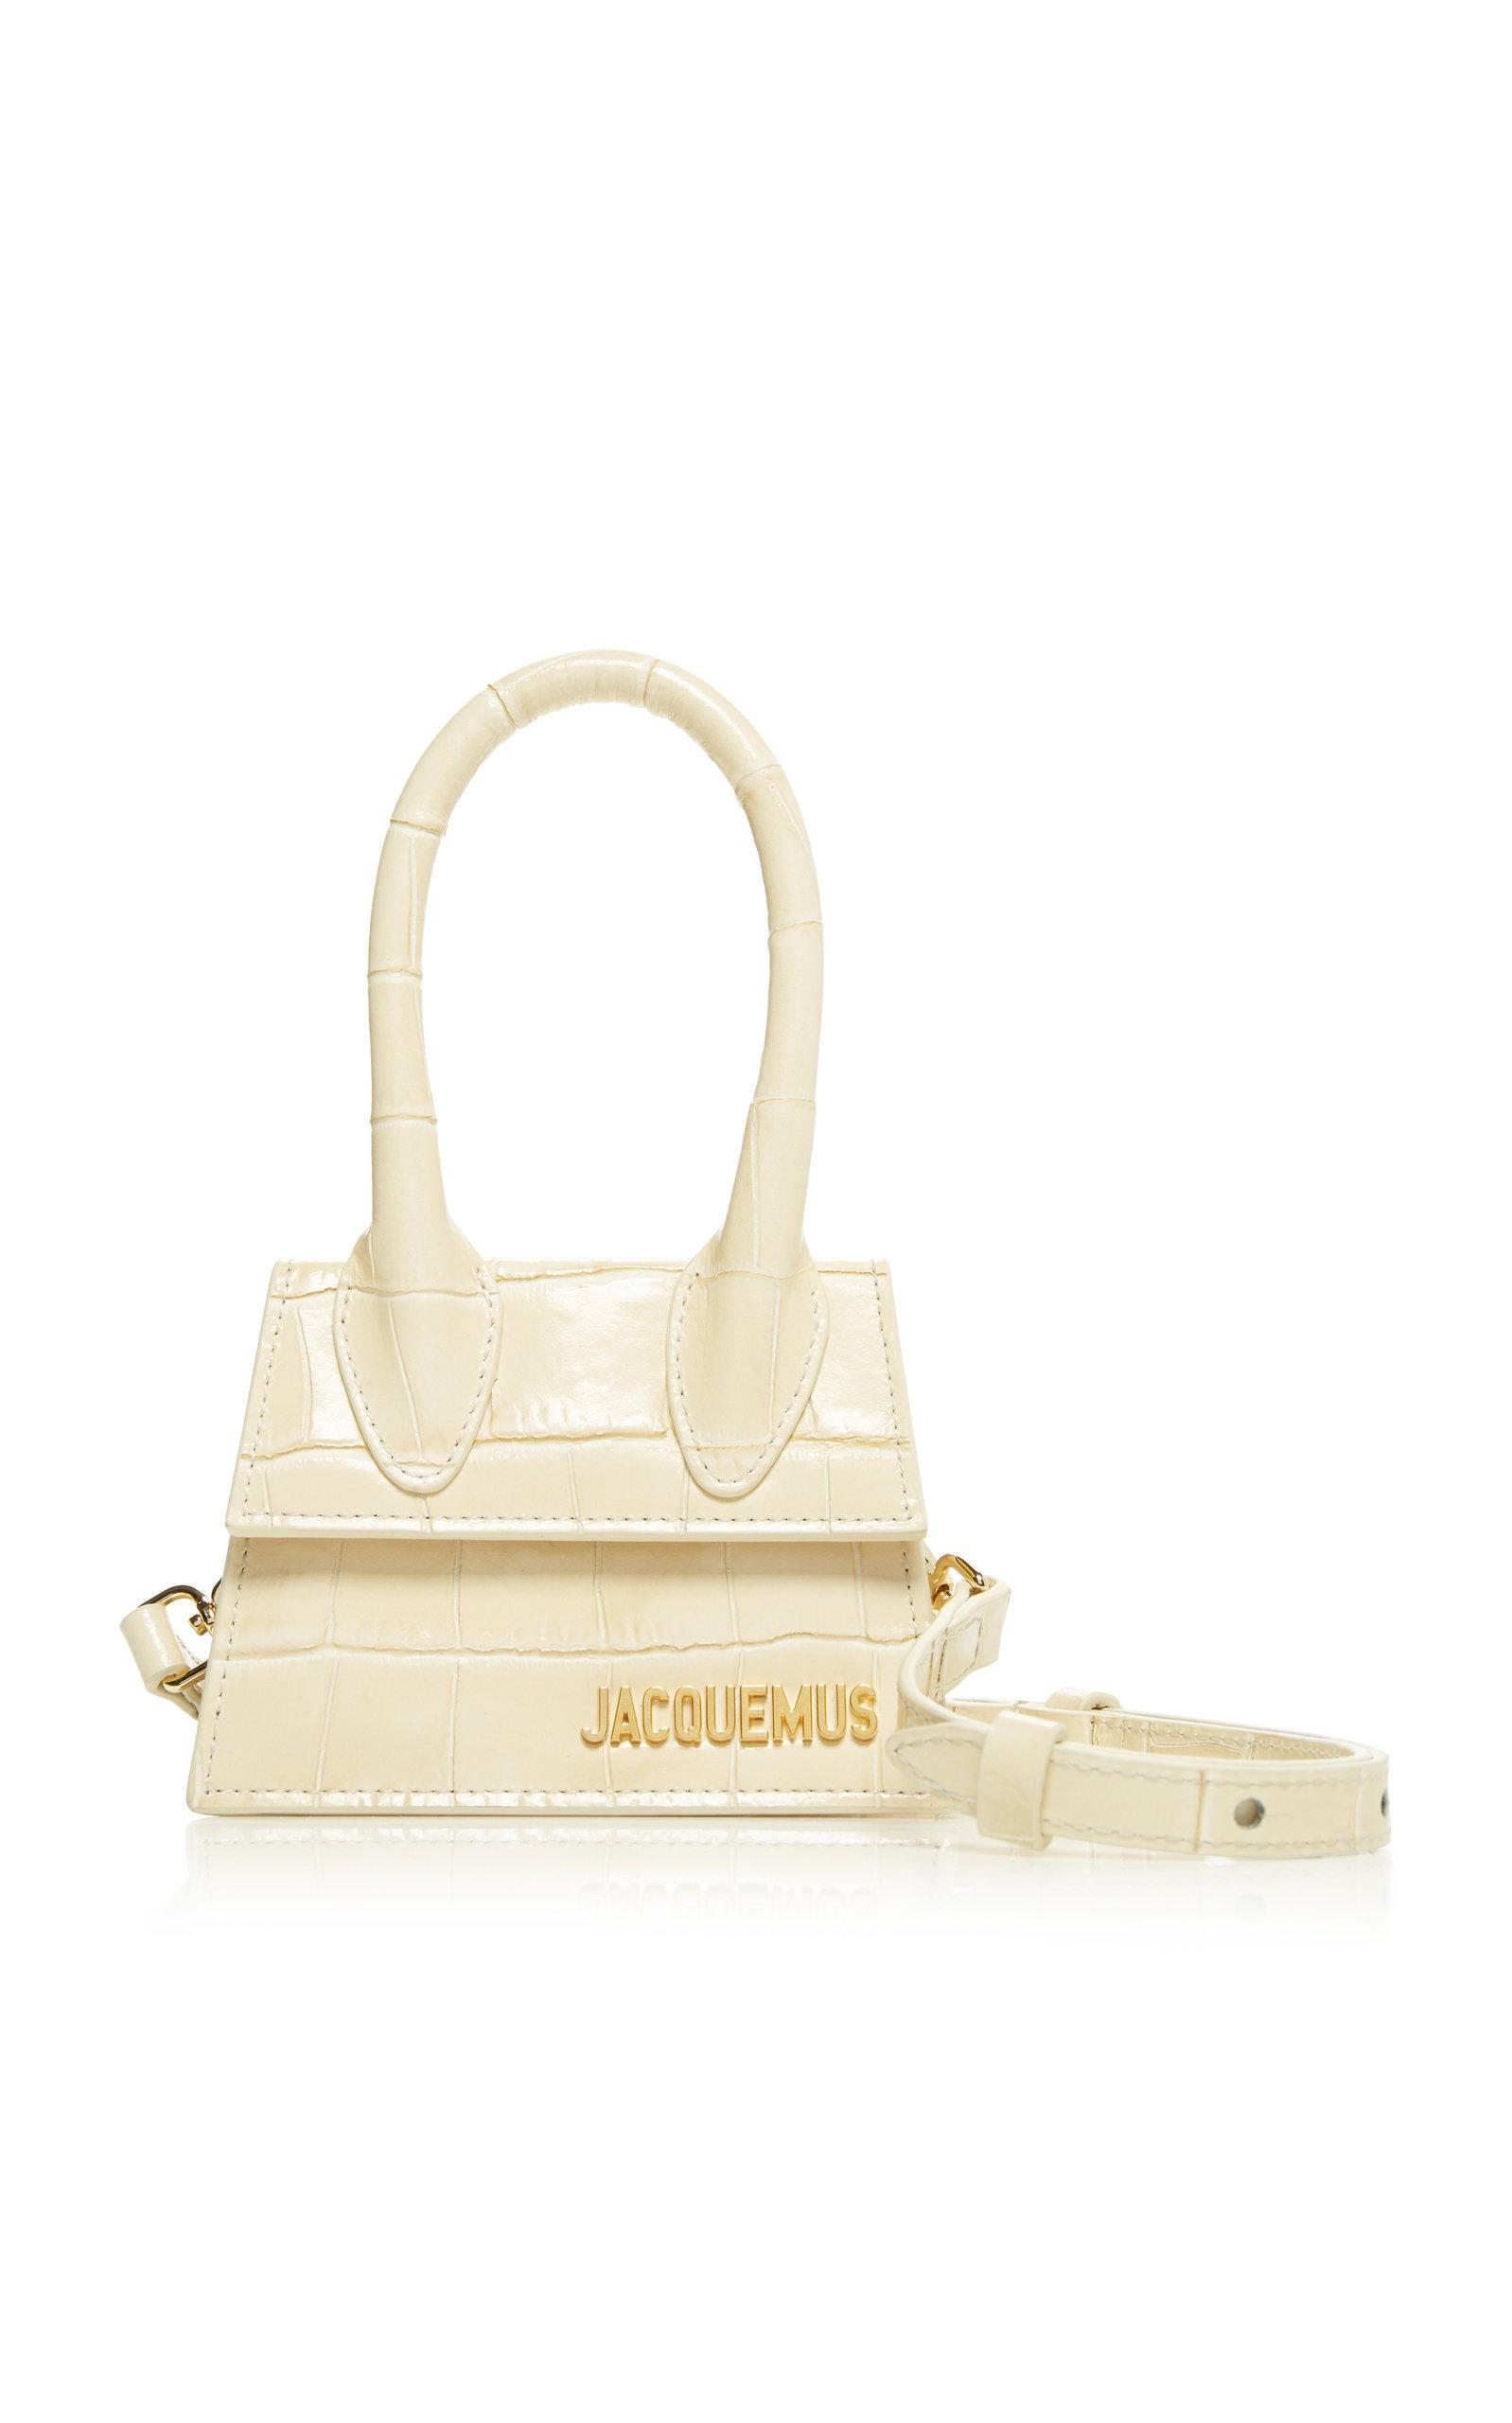 b4afbe8dda Jacquemus Le Chiquito Leather Mini Bag in 2019 | Want | Mini bag ...